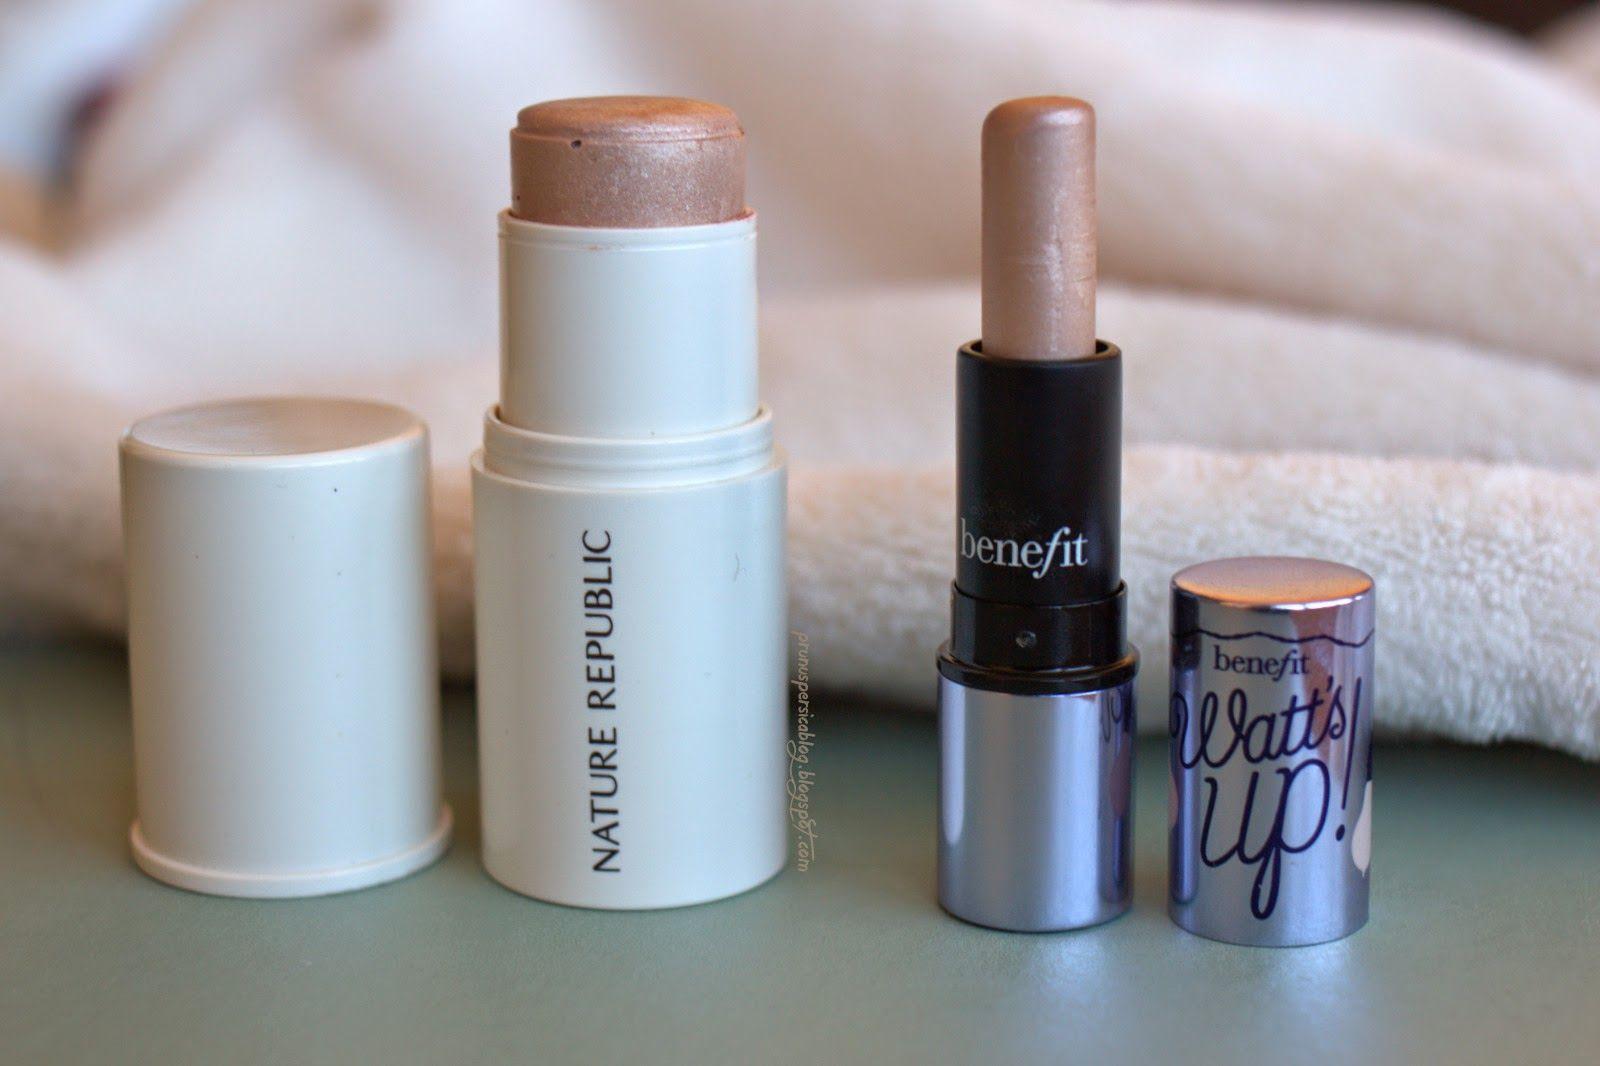 Clon del Watt's up! de Benefit!   Benefit Cosmetics Watt's Up! DUPE  prunuspersicablog.blogspot.com   #benefit #wattsup #highlighter #dupe